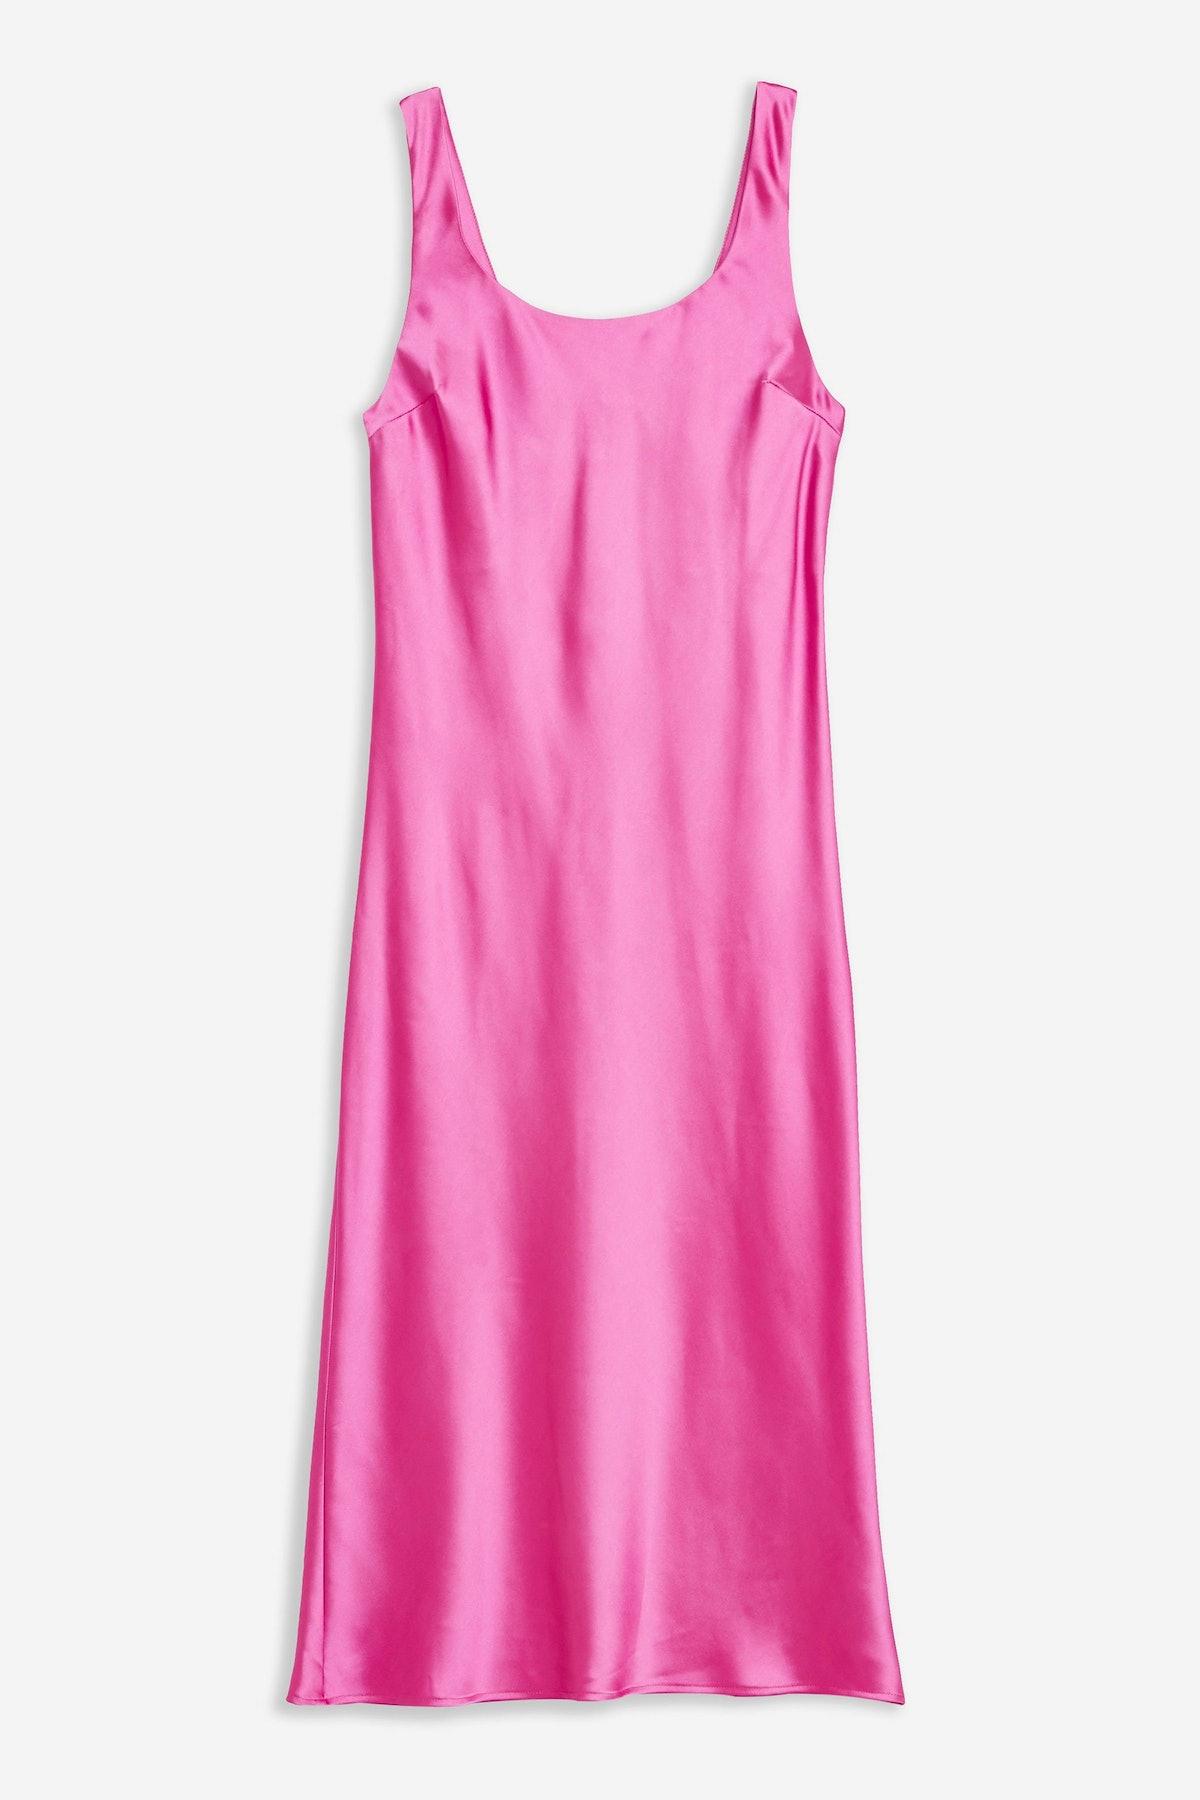 Pink Built Up Slip Dress